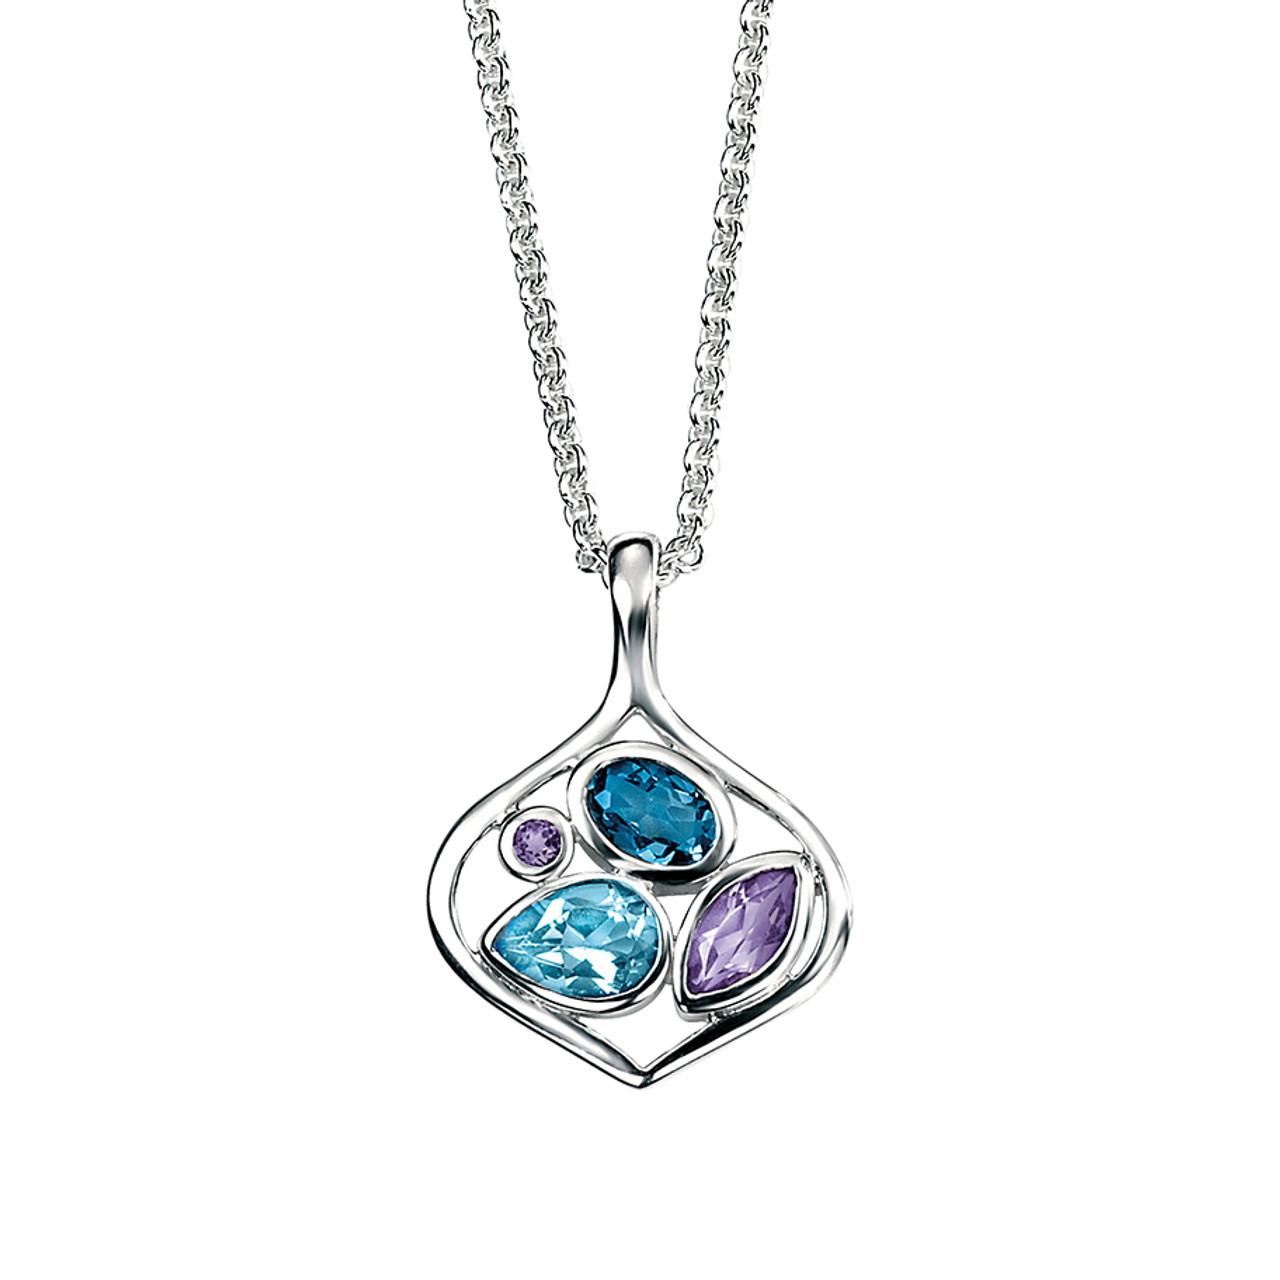 Silver Amethyst & Blue Topaz open Pendant on Chain